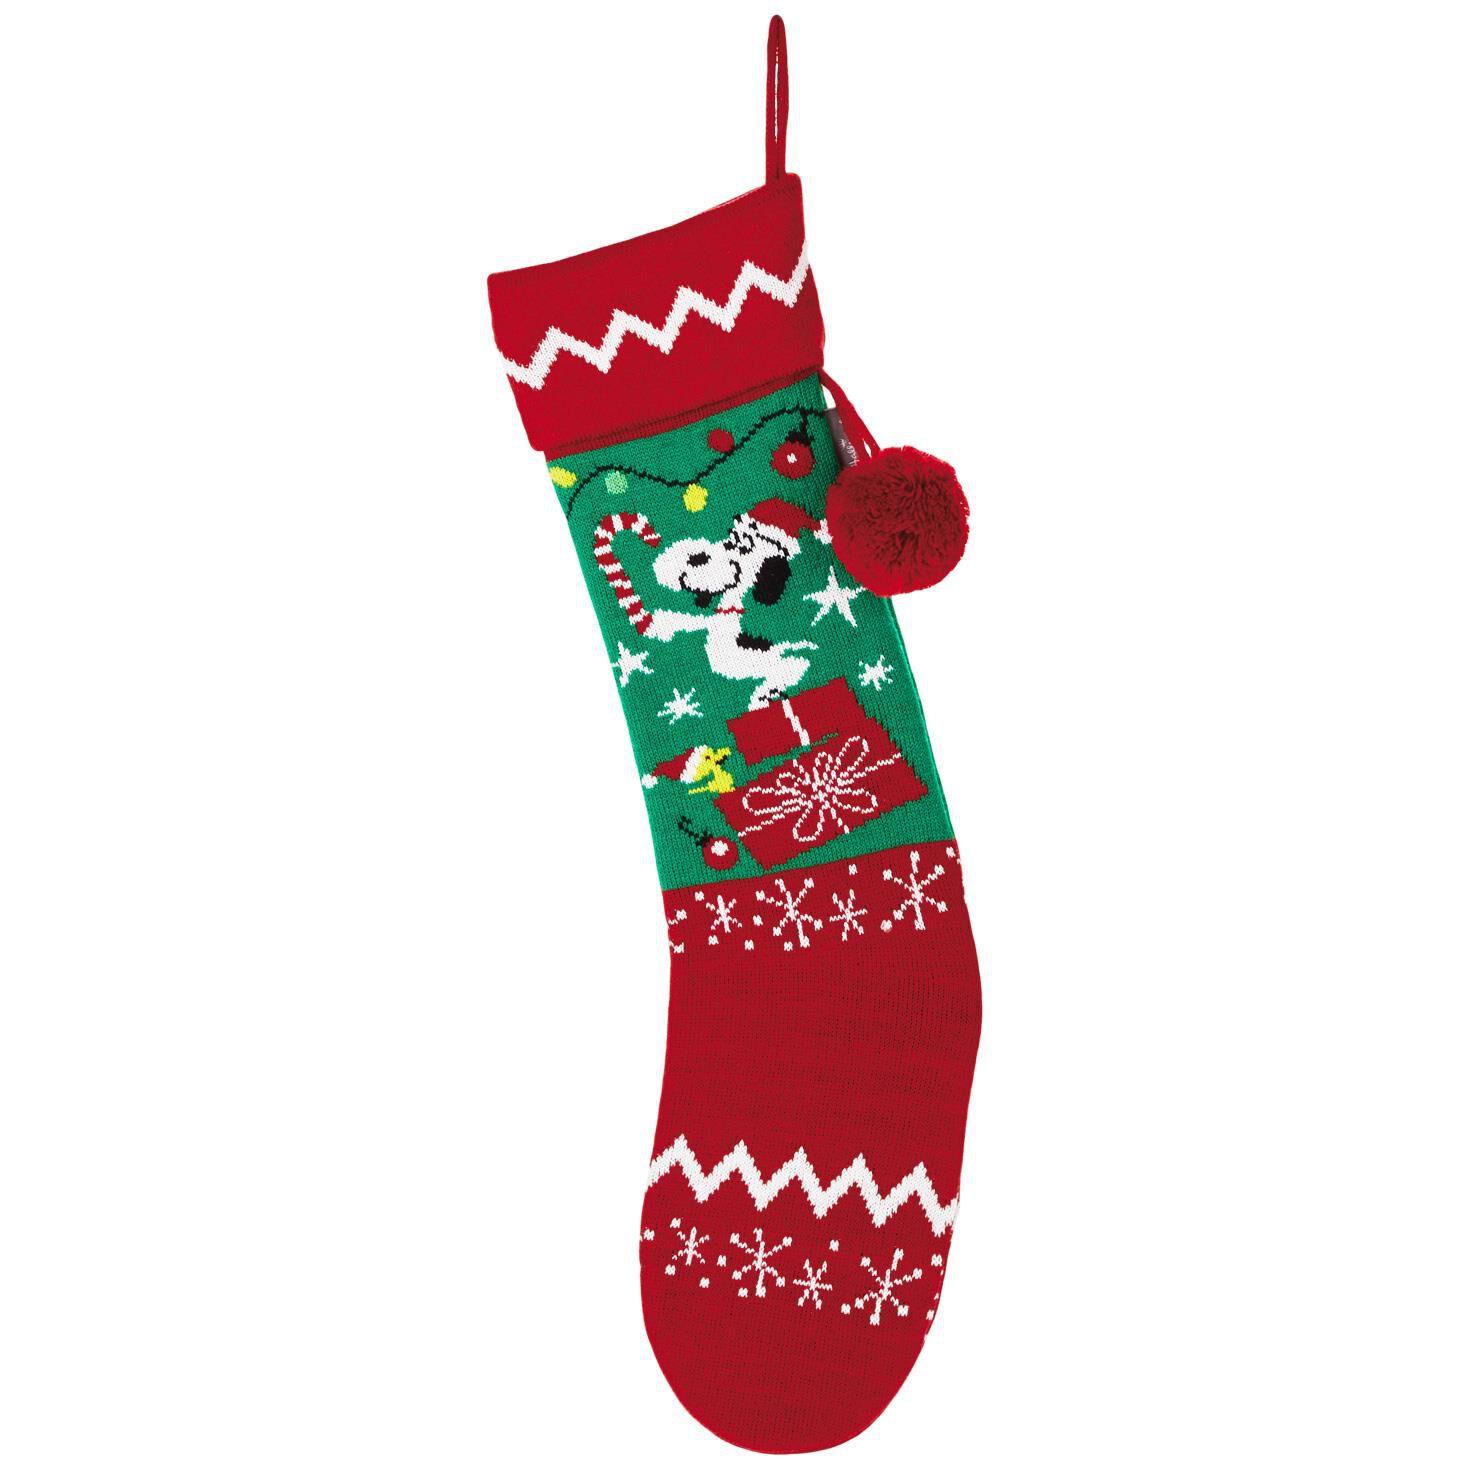 peanuts snoopy knit christmas stocking decorative accessories hallmark - Snoopy Christmas Stocking